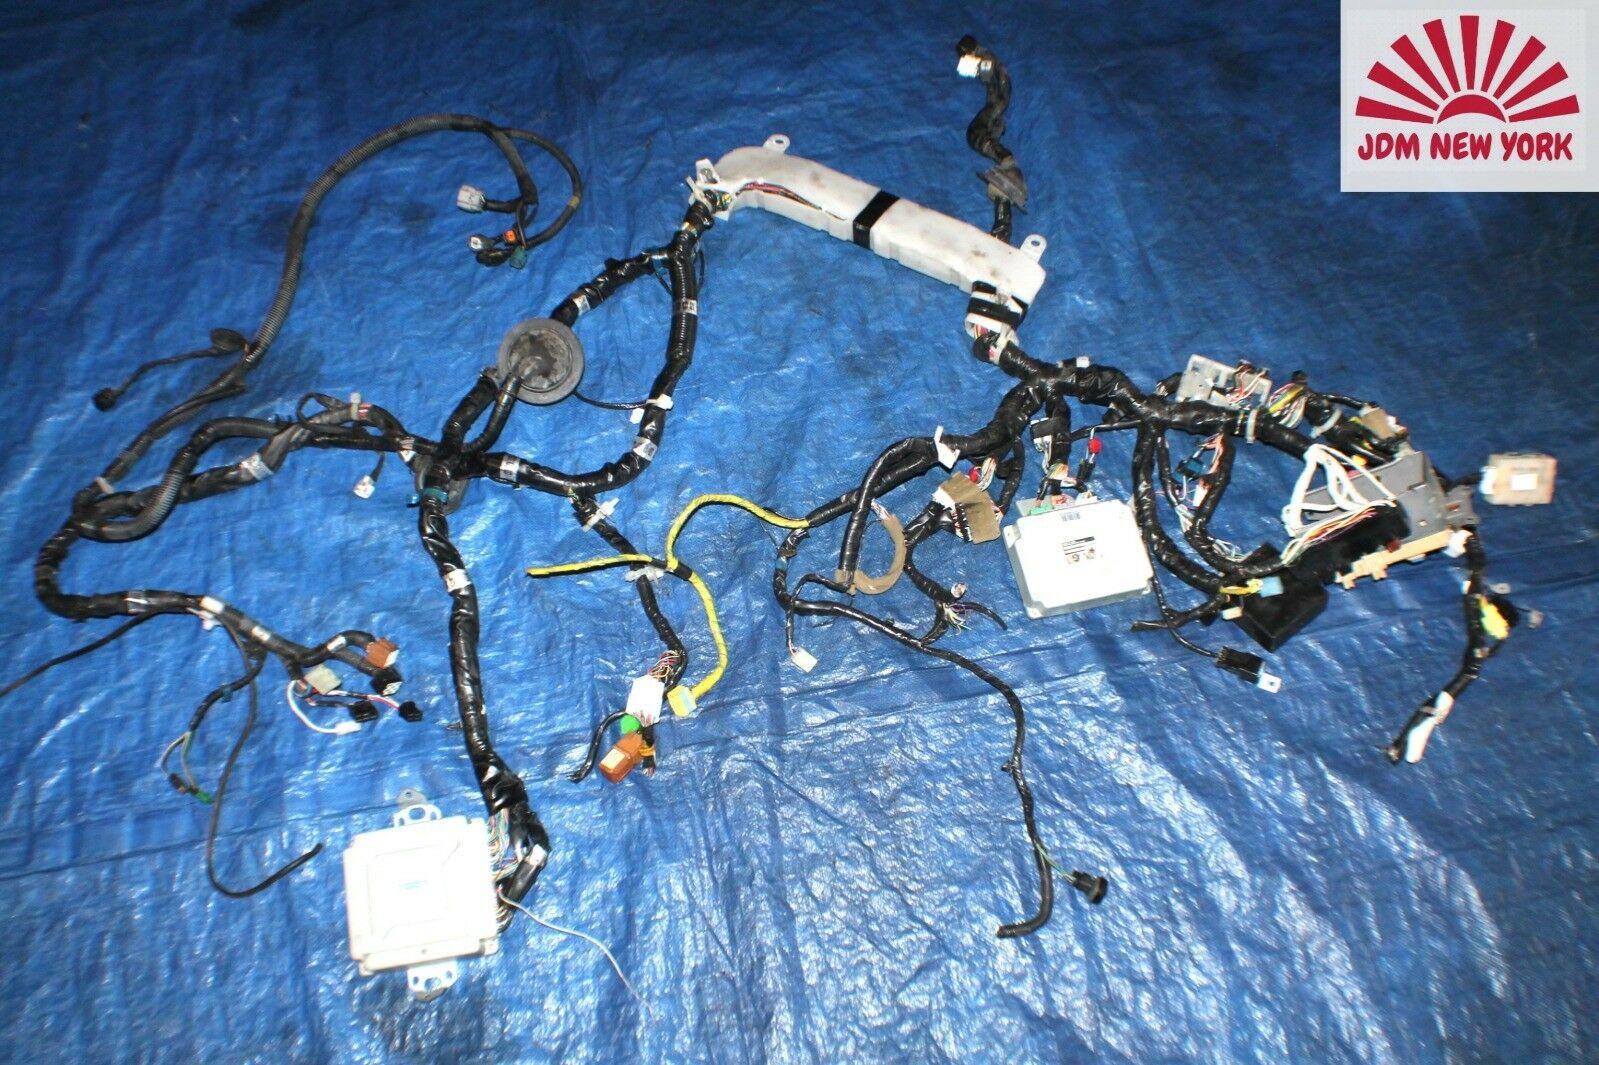 JDM SUBARU IMPREZA WRX G11 OEM RHD ECU TCU HARNESS 22611AF461 31711-AE920 on subaru radio harness, subaru tail lights, dual car stereo wire harness, subaru gauges, subaru lighting harness, subaru subwoofer harness, subaru radio wiring diagram, subaru speed sensor, subaru coil wire harness, subaru parts warehouse, subaru outback engine diagram, subaru transmission harness, subaru headlight harness, subaru oil filter, subaru timing chain, subaru hood, subaru wiring connector, subaru engine harness, subaru intake, subaru muffler,